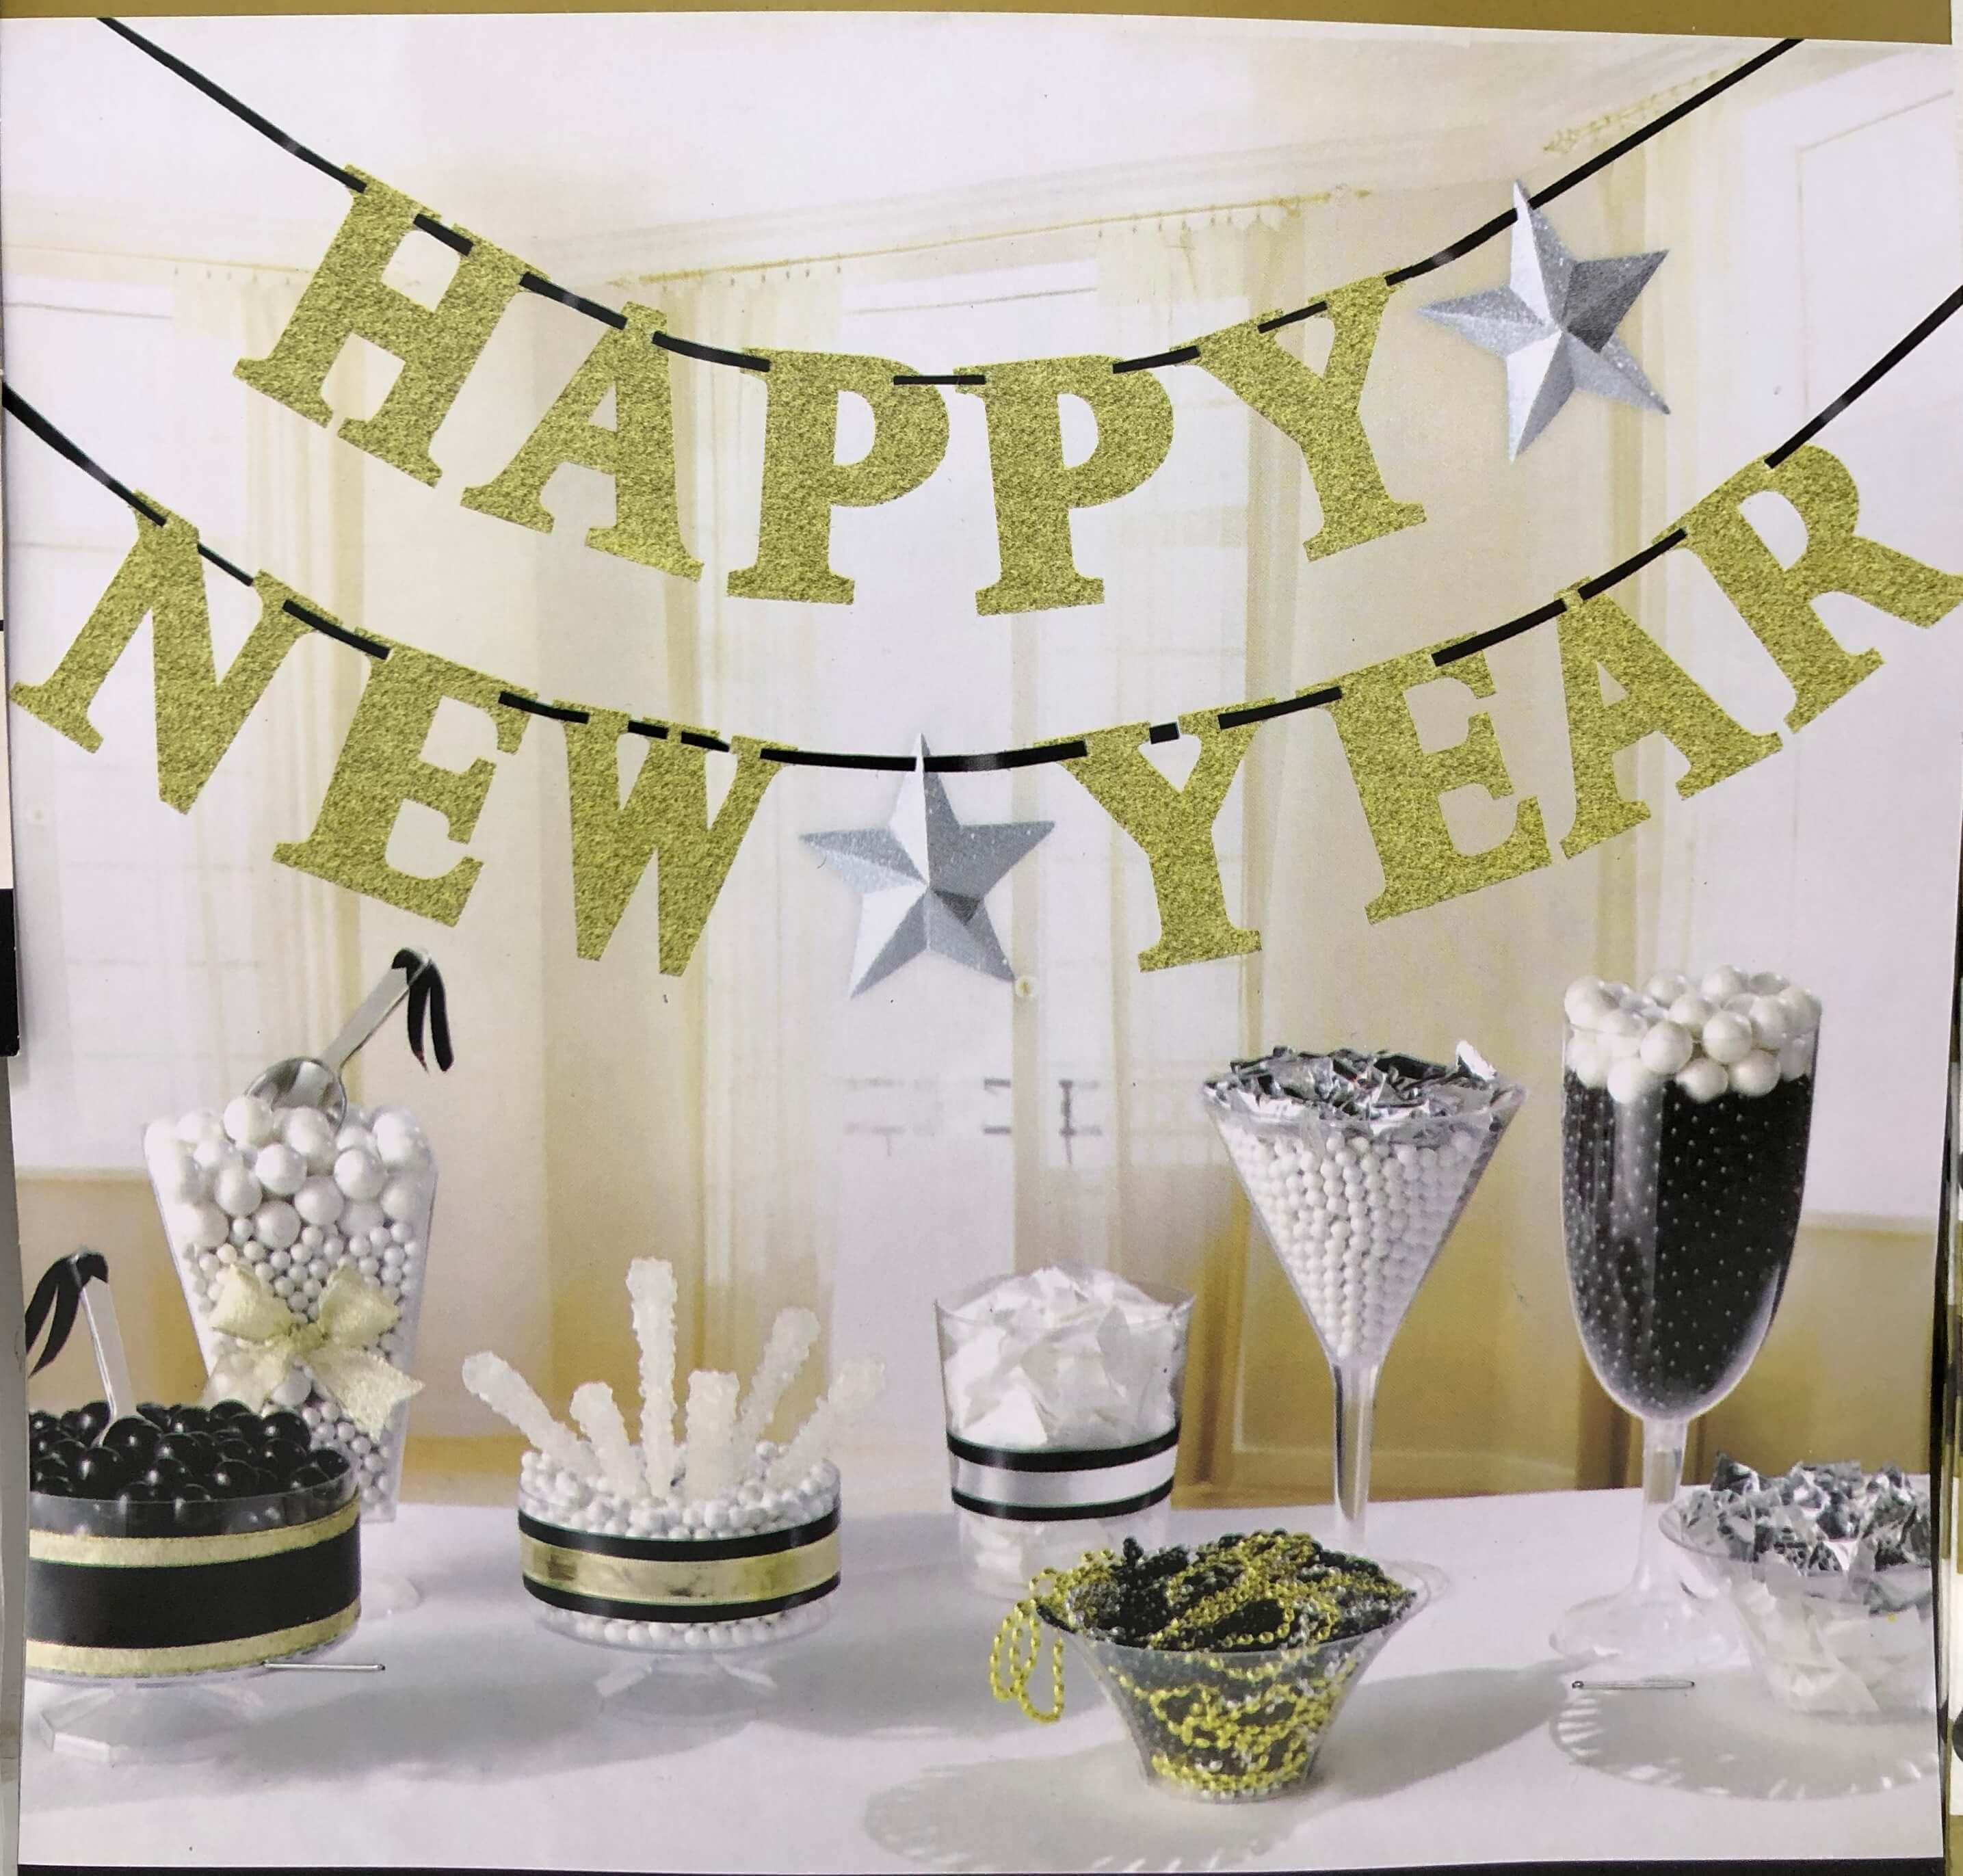 Happy New Year decorations